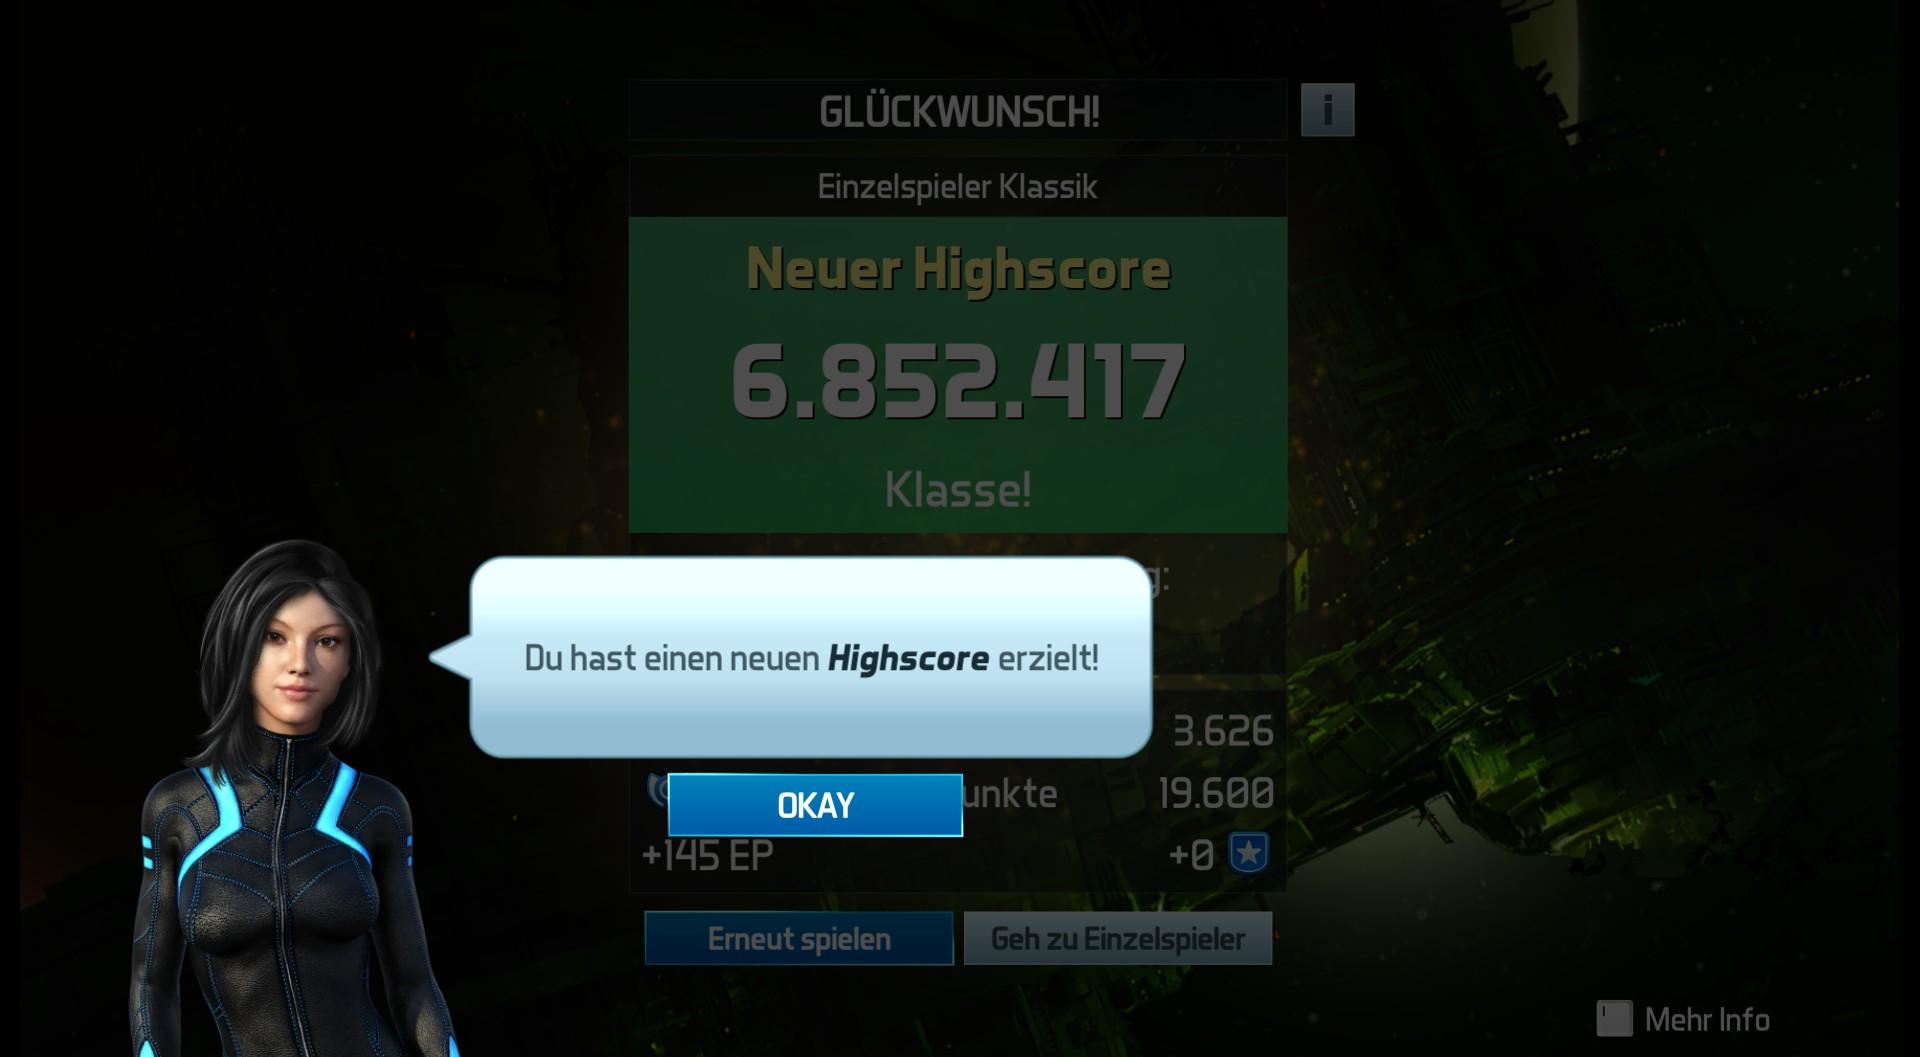 Pinball FX3: Alien: Isolation Pinball [Classic] 6,852,417 points